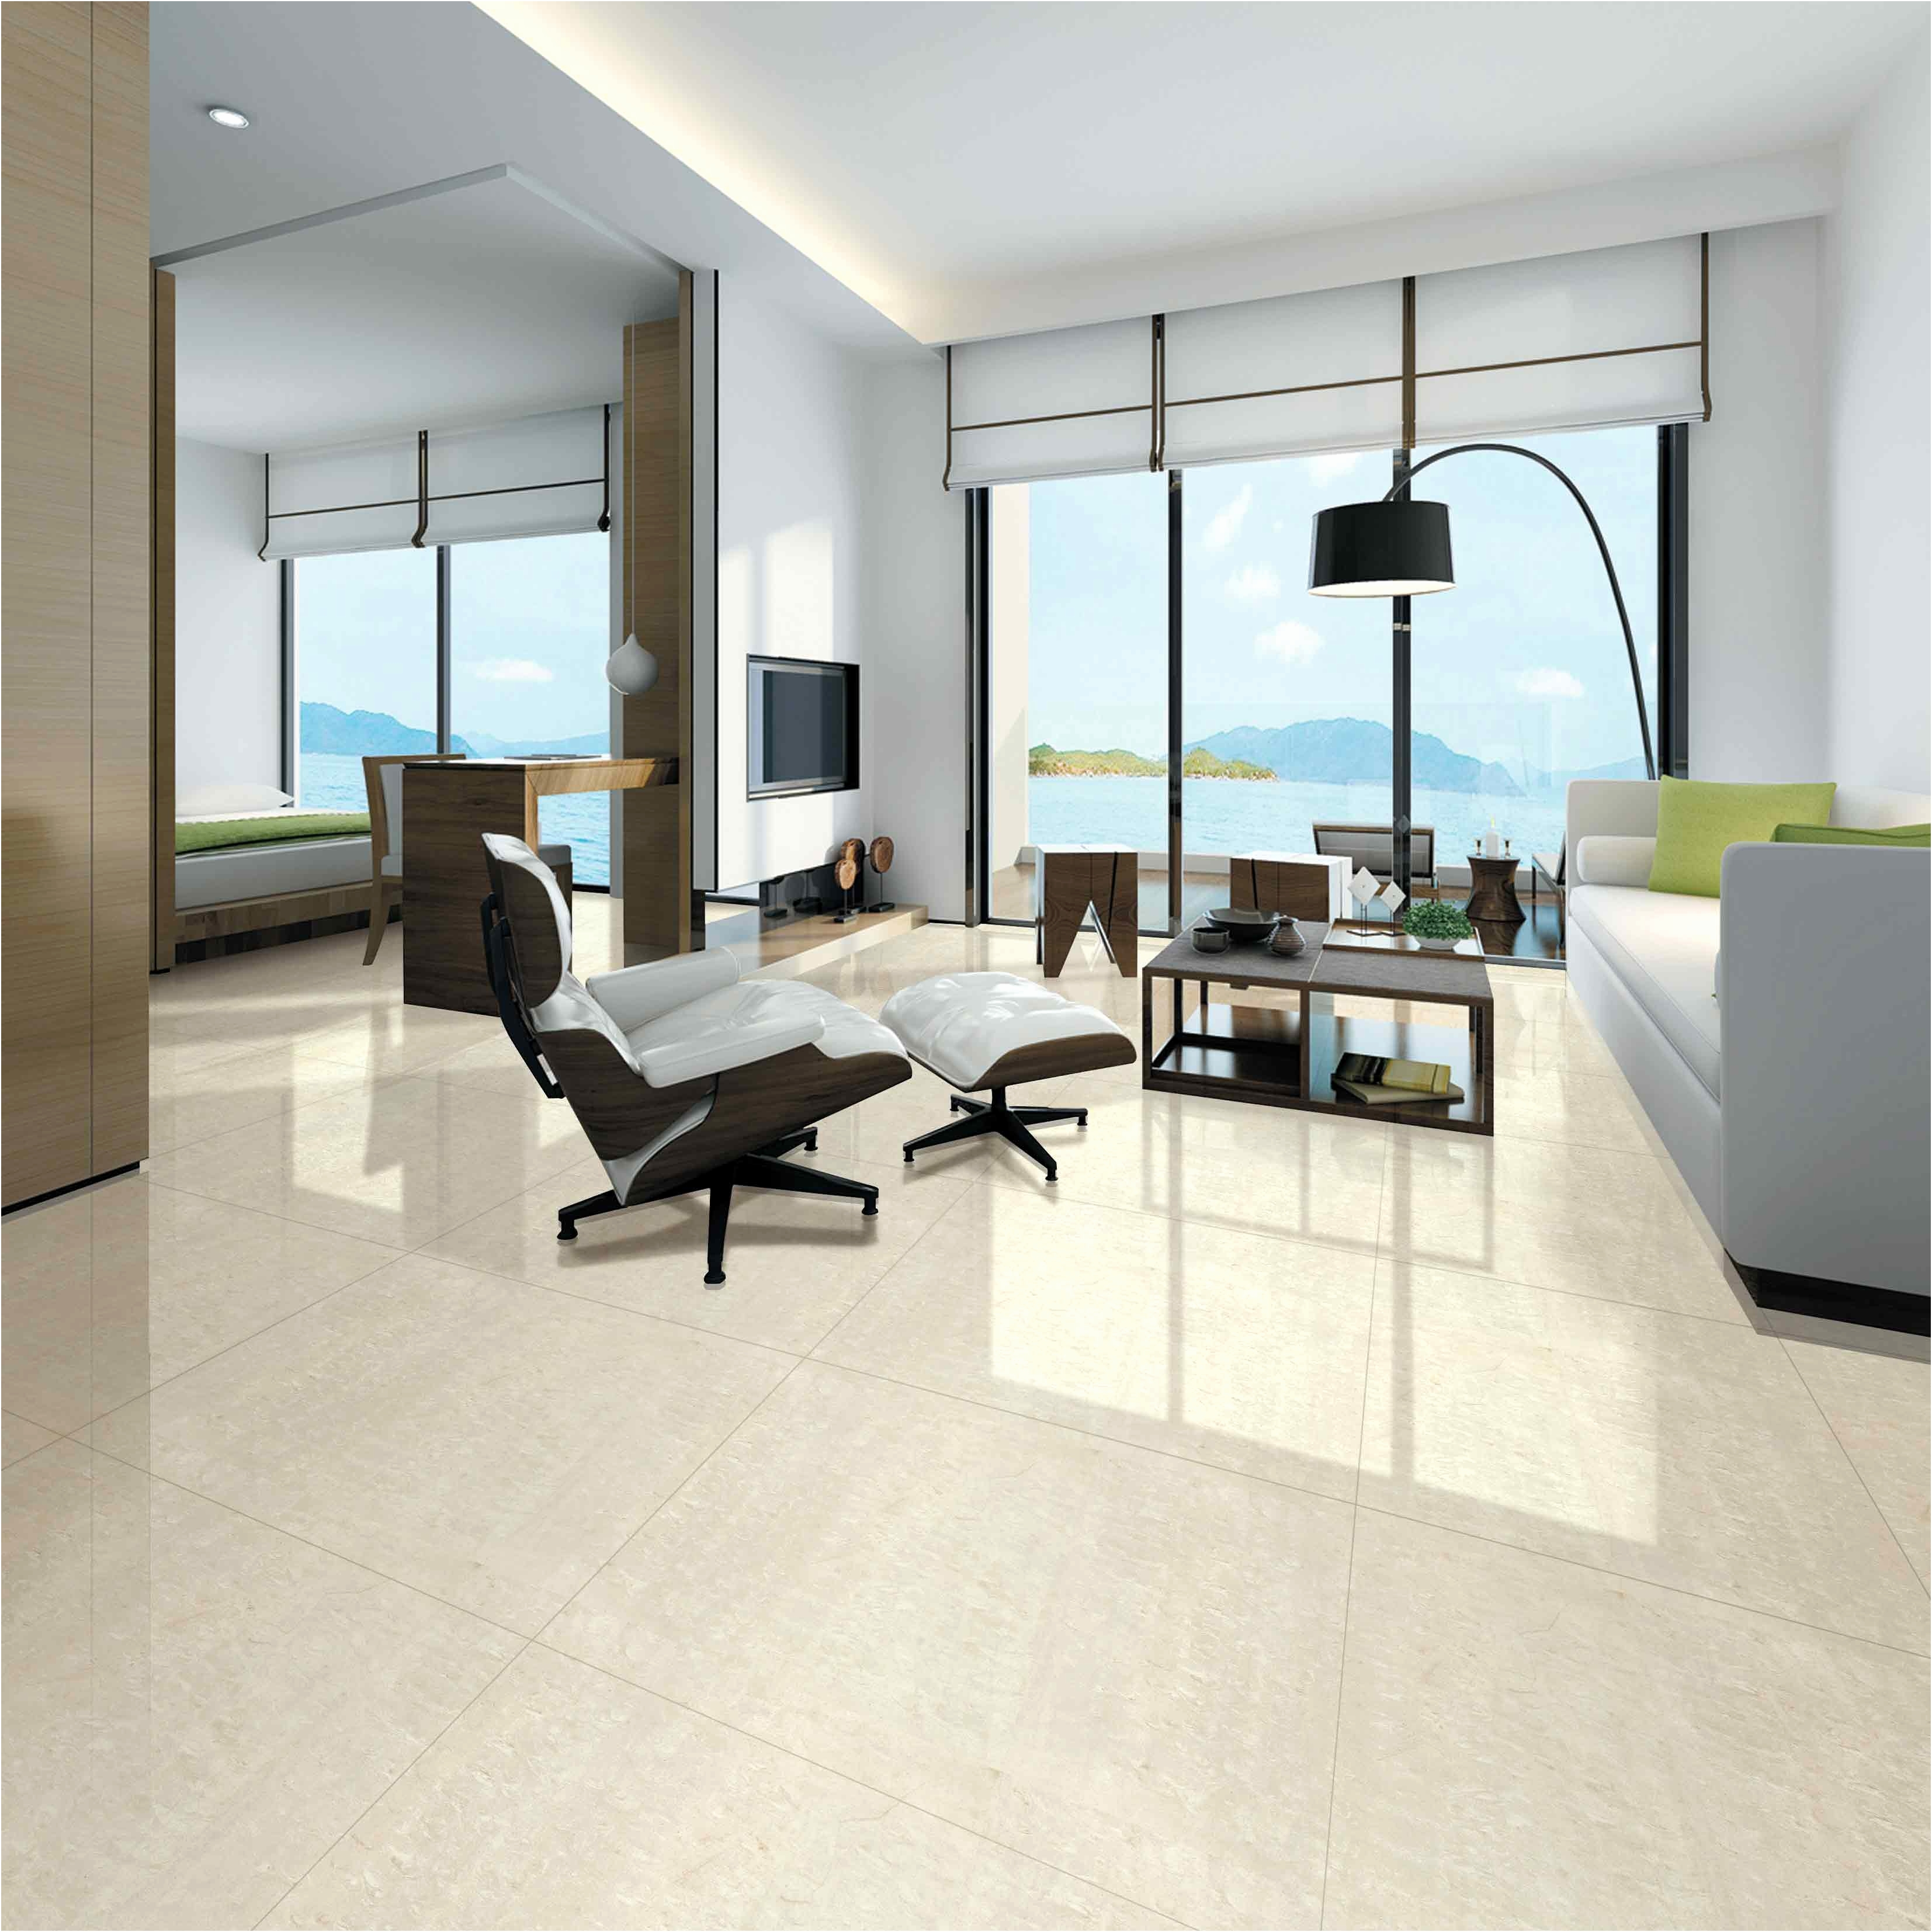 wonderful floor tiles bathroom photograph-Fascinating Floor Tiles Bathroom Concept